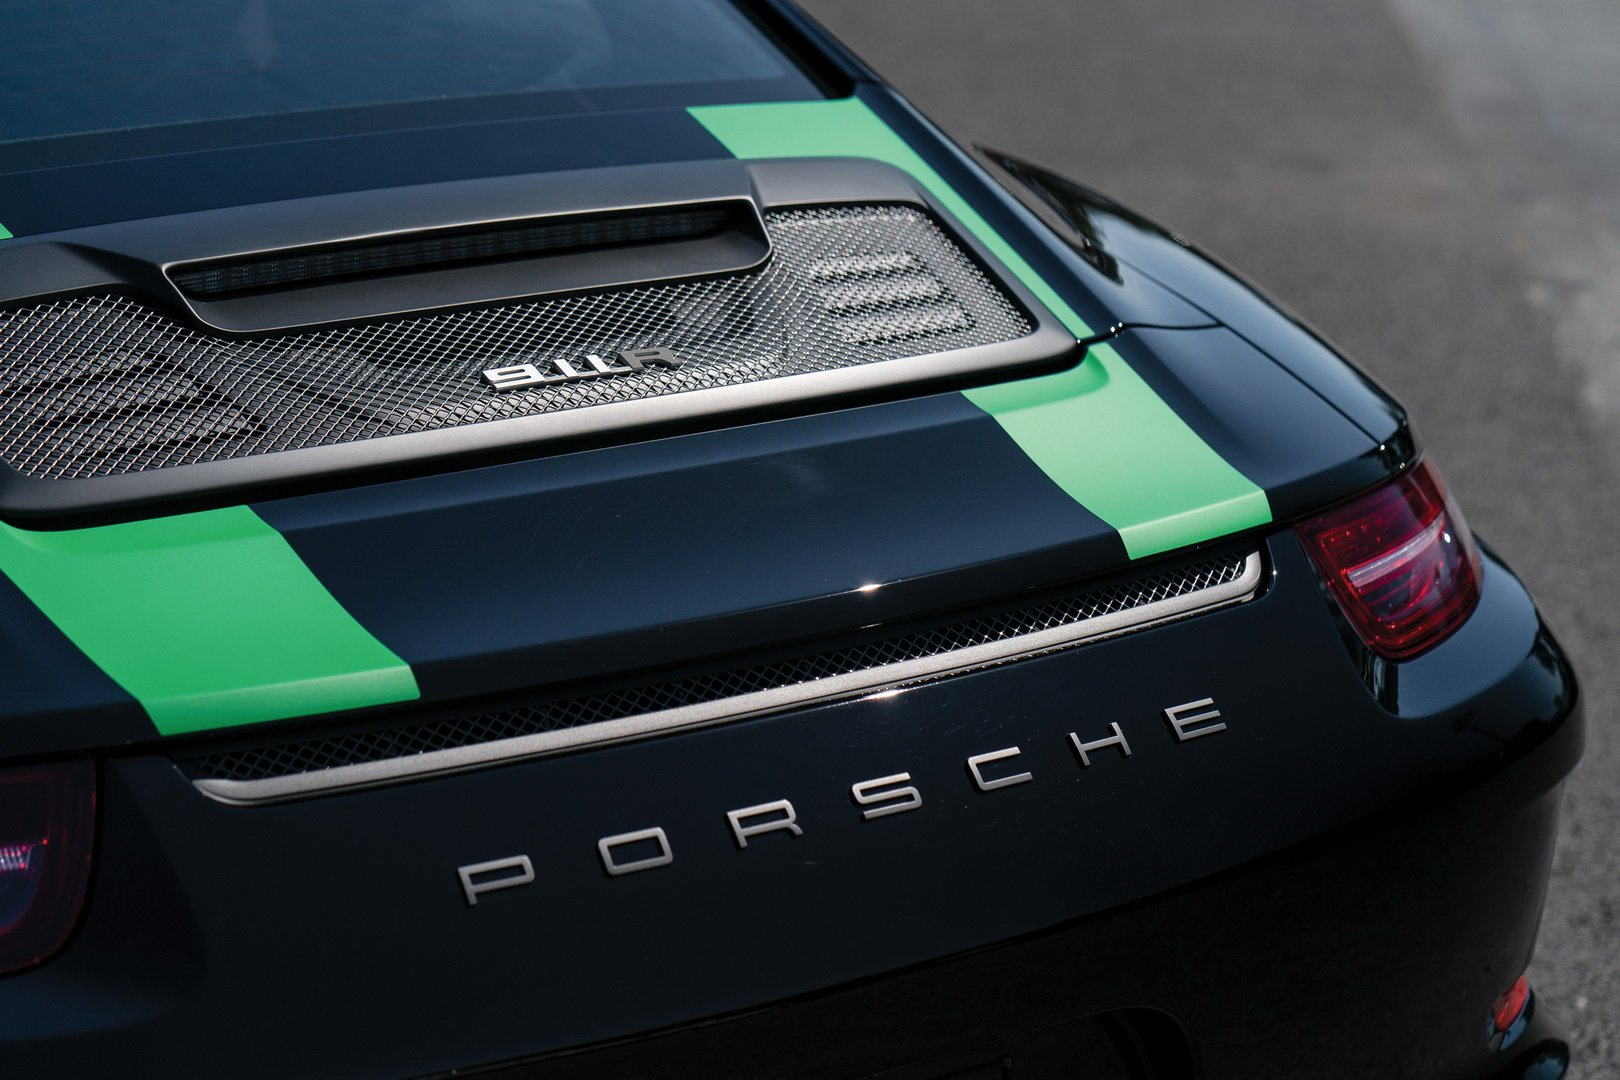 b5b4ebb2-2016-porsche-911-r-9